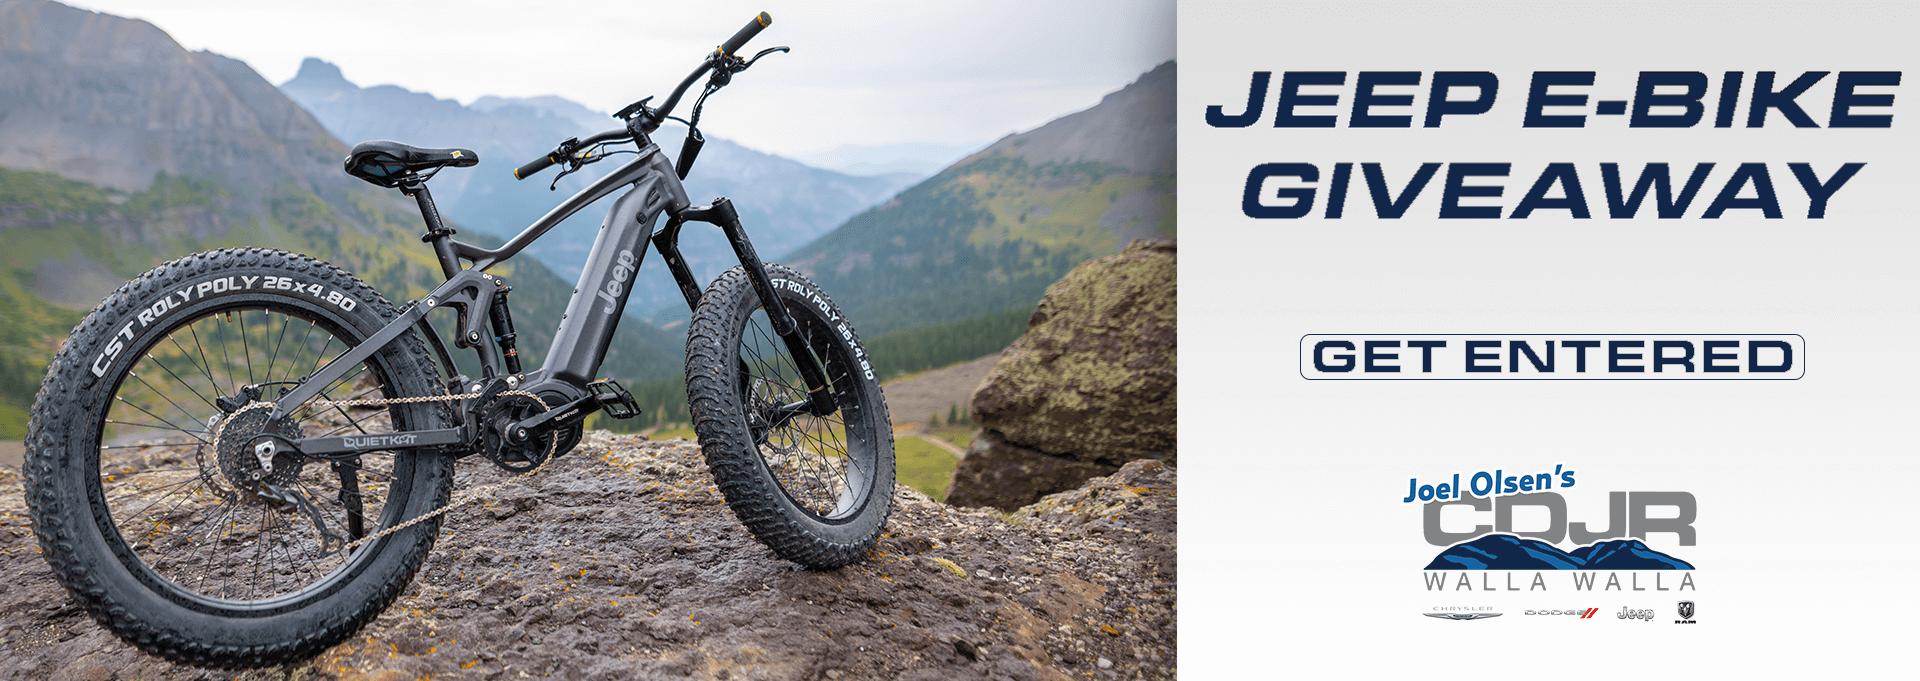 Jeep-E-Bike-Giveaway